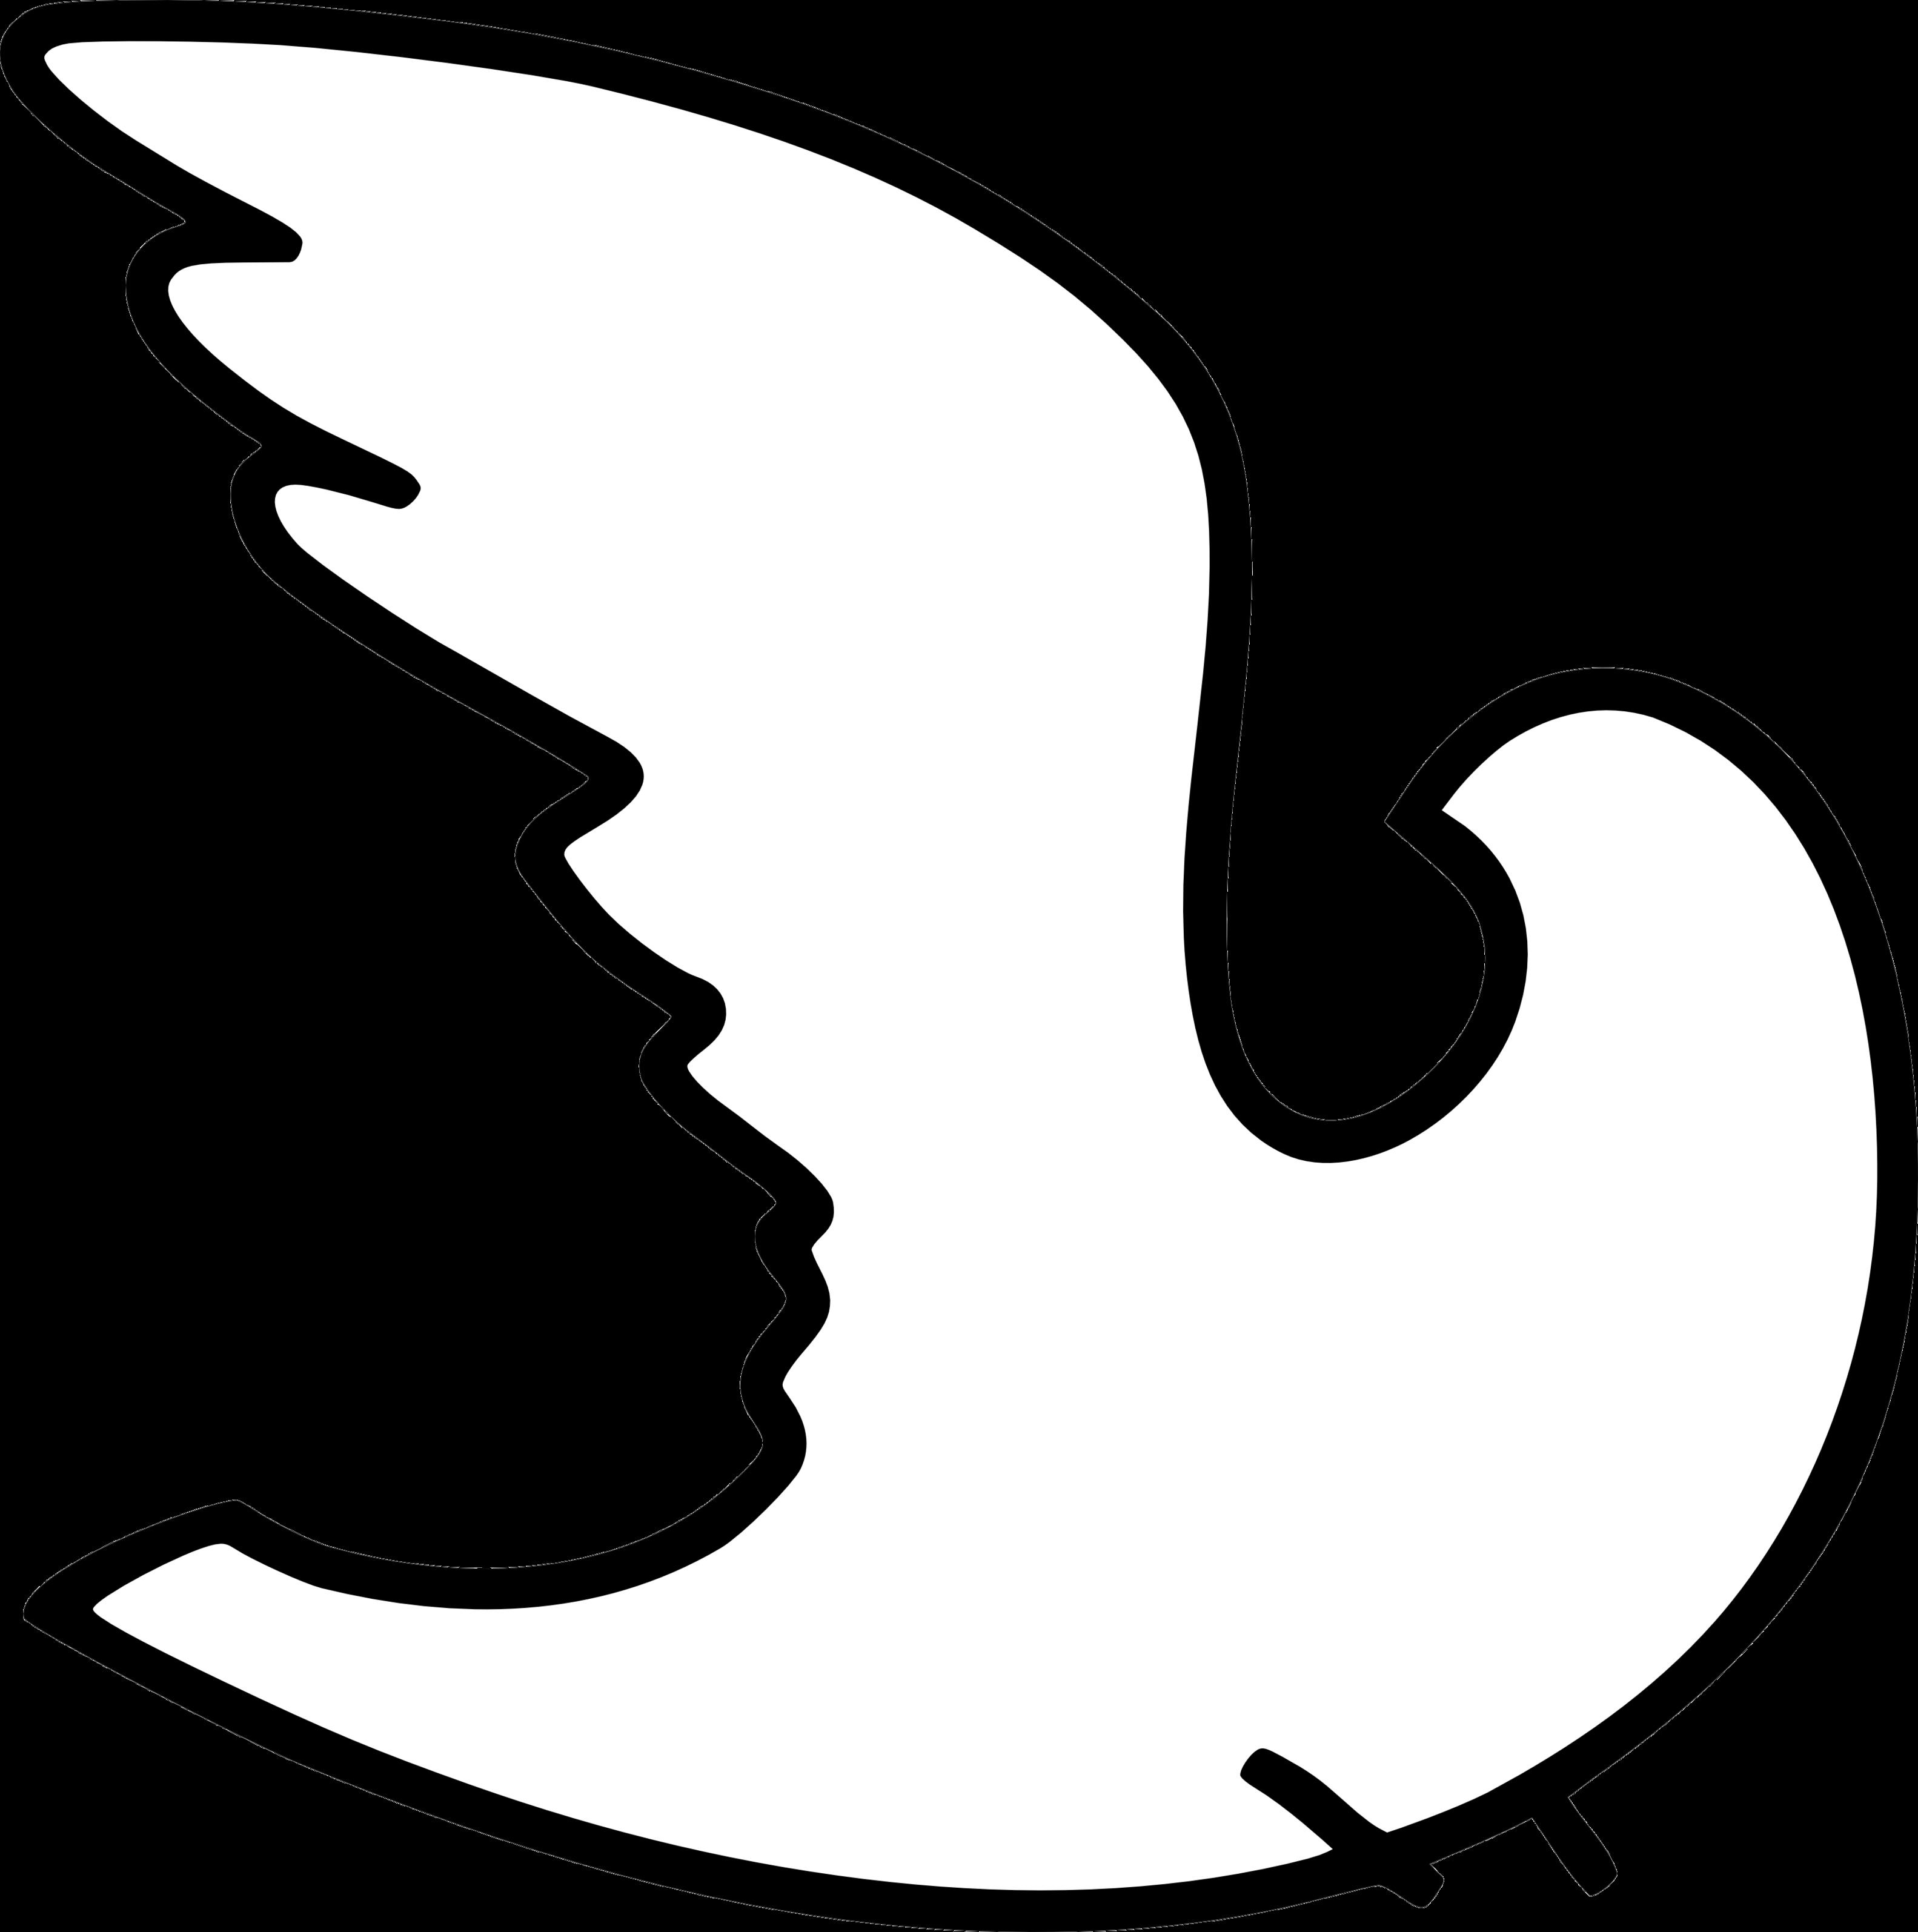 White Dove Symbol Of Peace - ClipArt Best